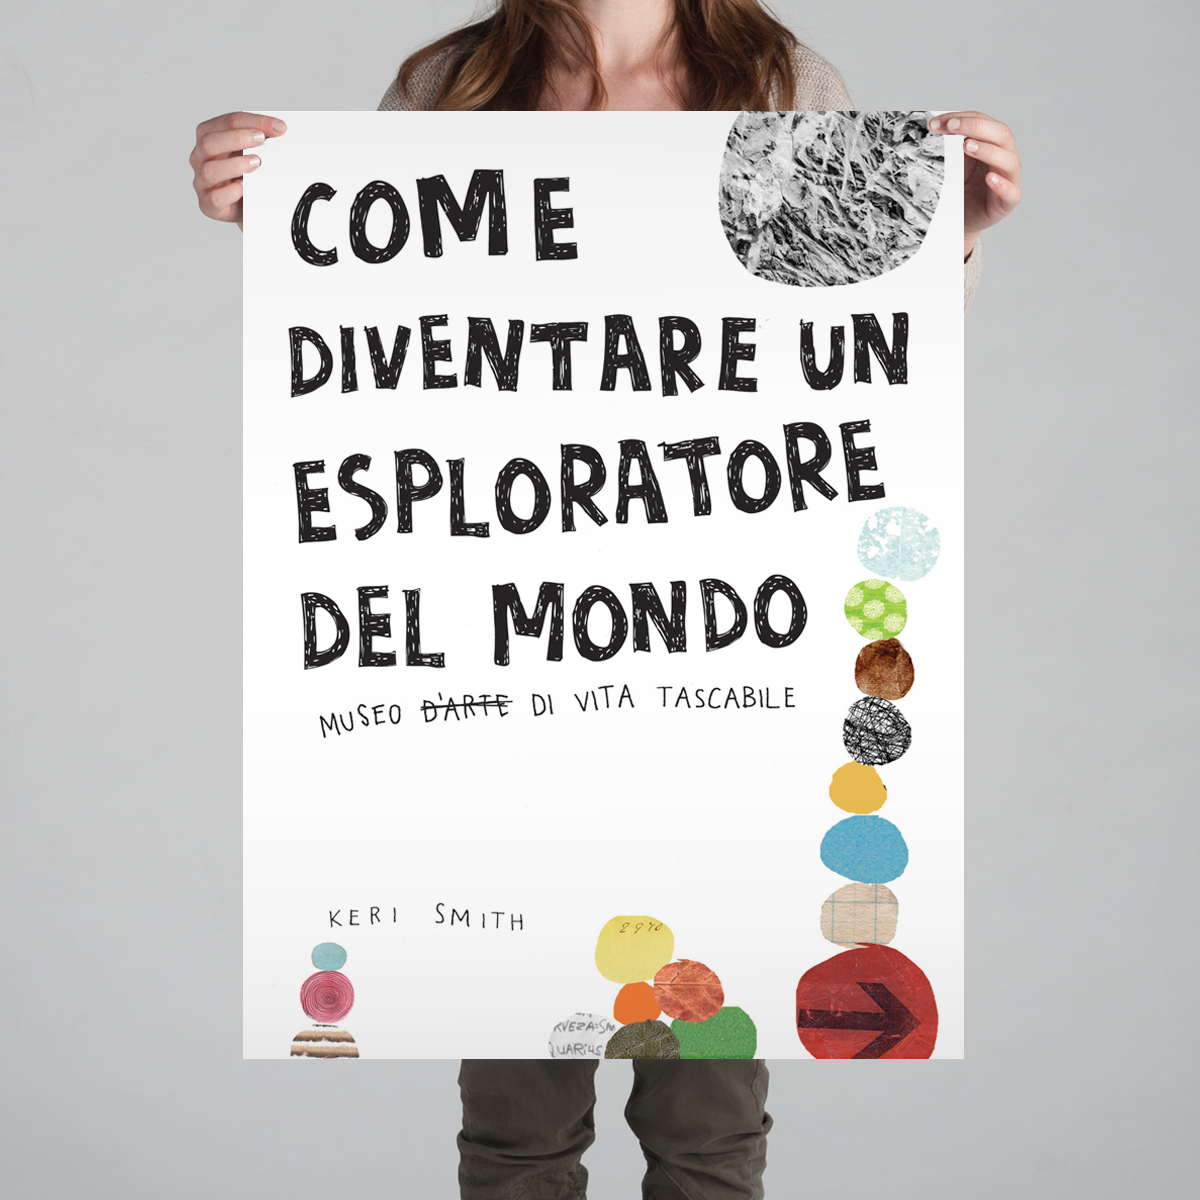 Follow us at http://expo2015book.tumblr.com #Expo2015 #Milan #WorldsFair